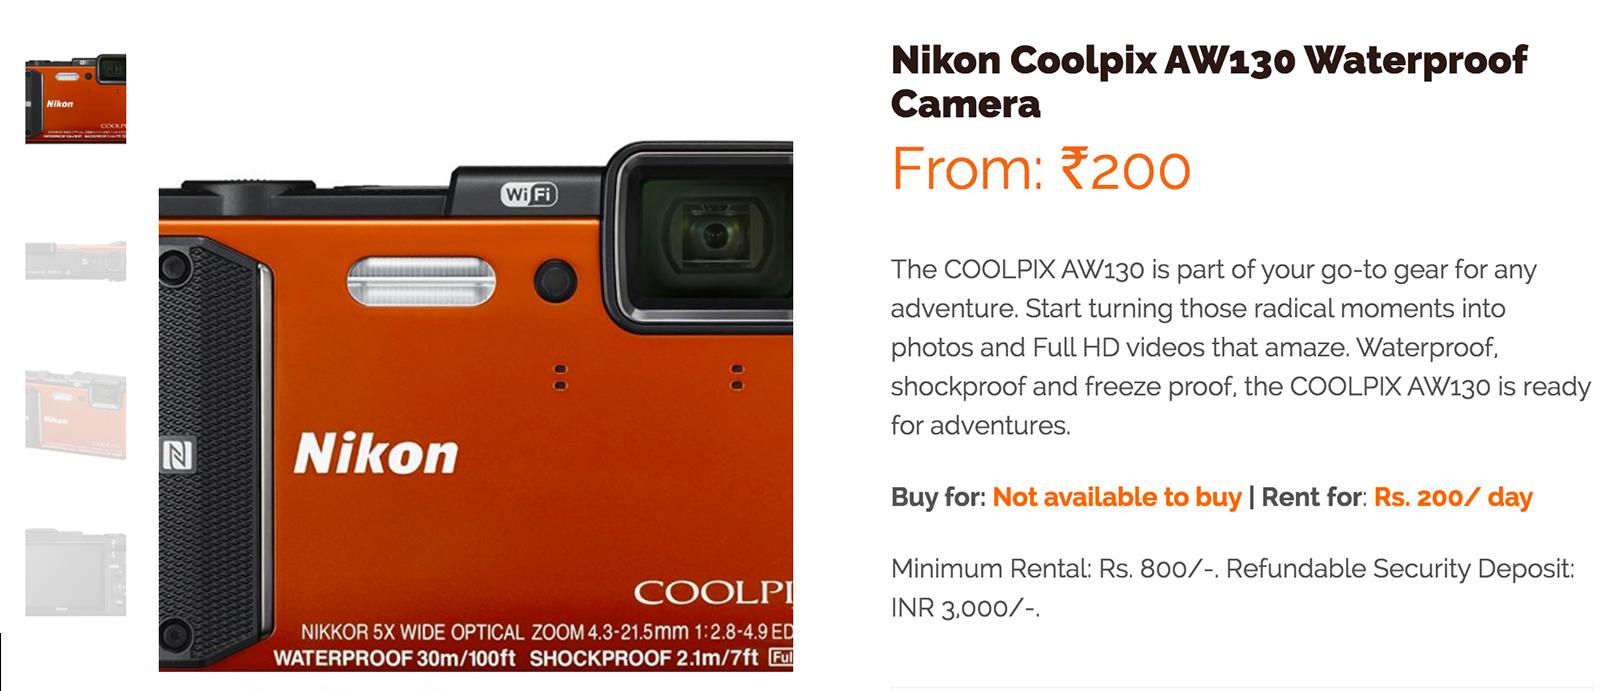 Nikon Coolpix AW130 Waterproof Camera